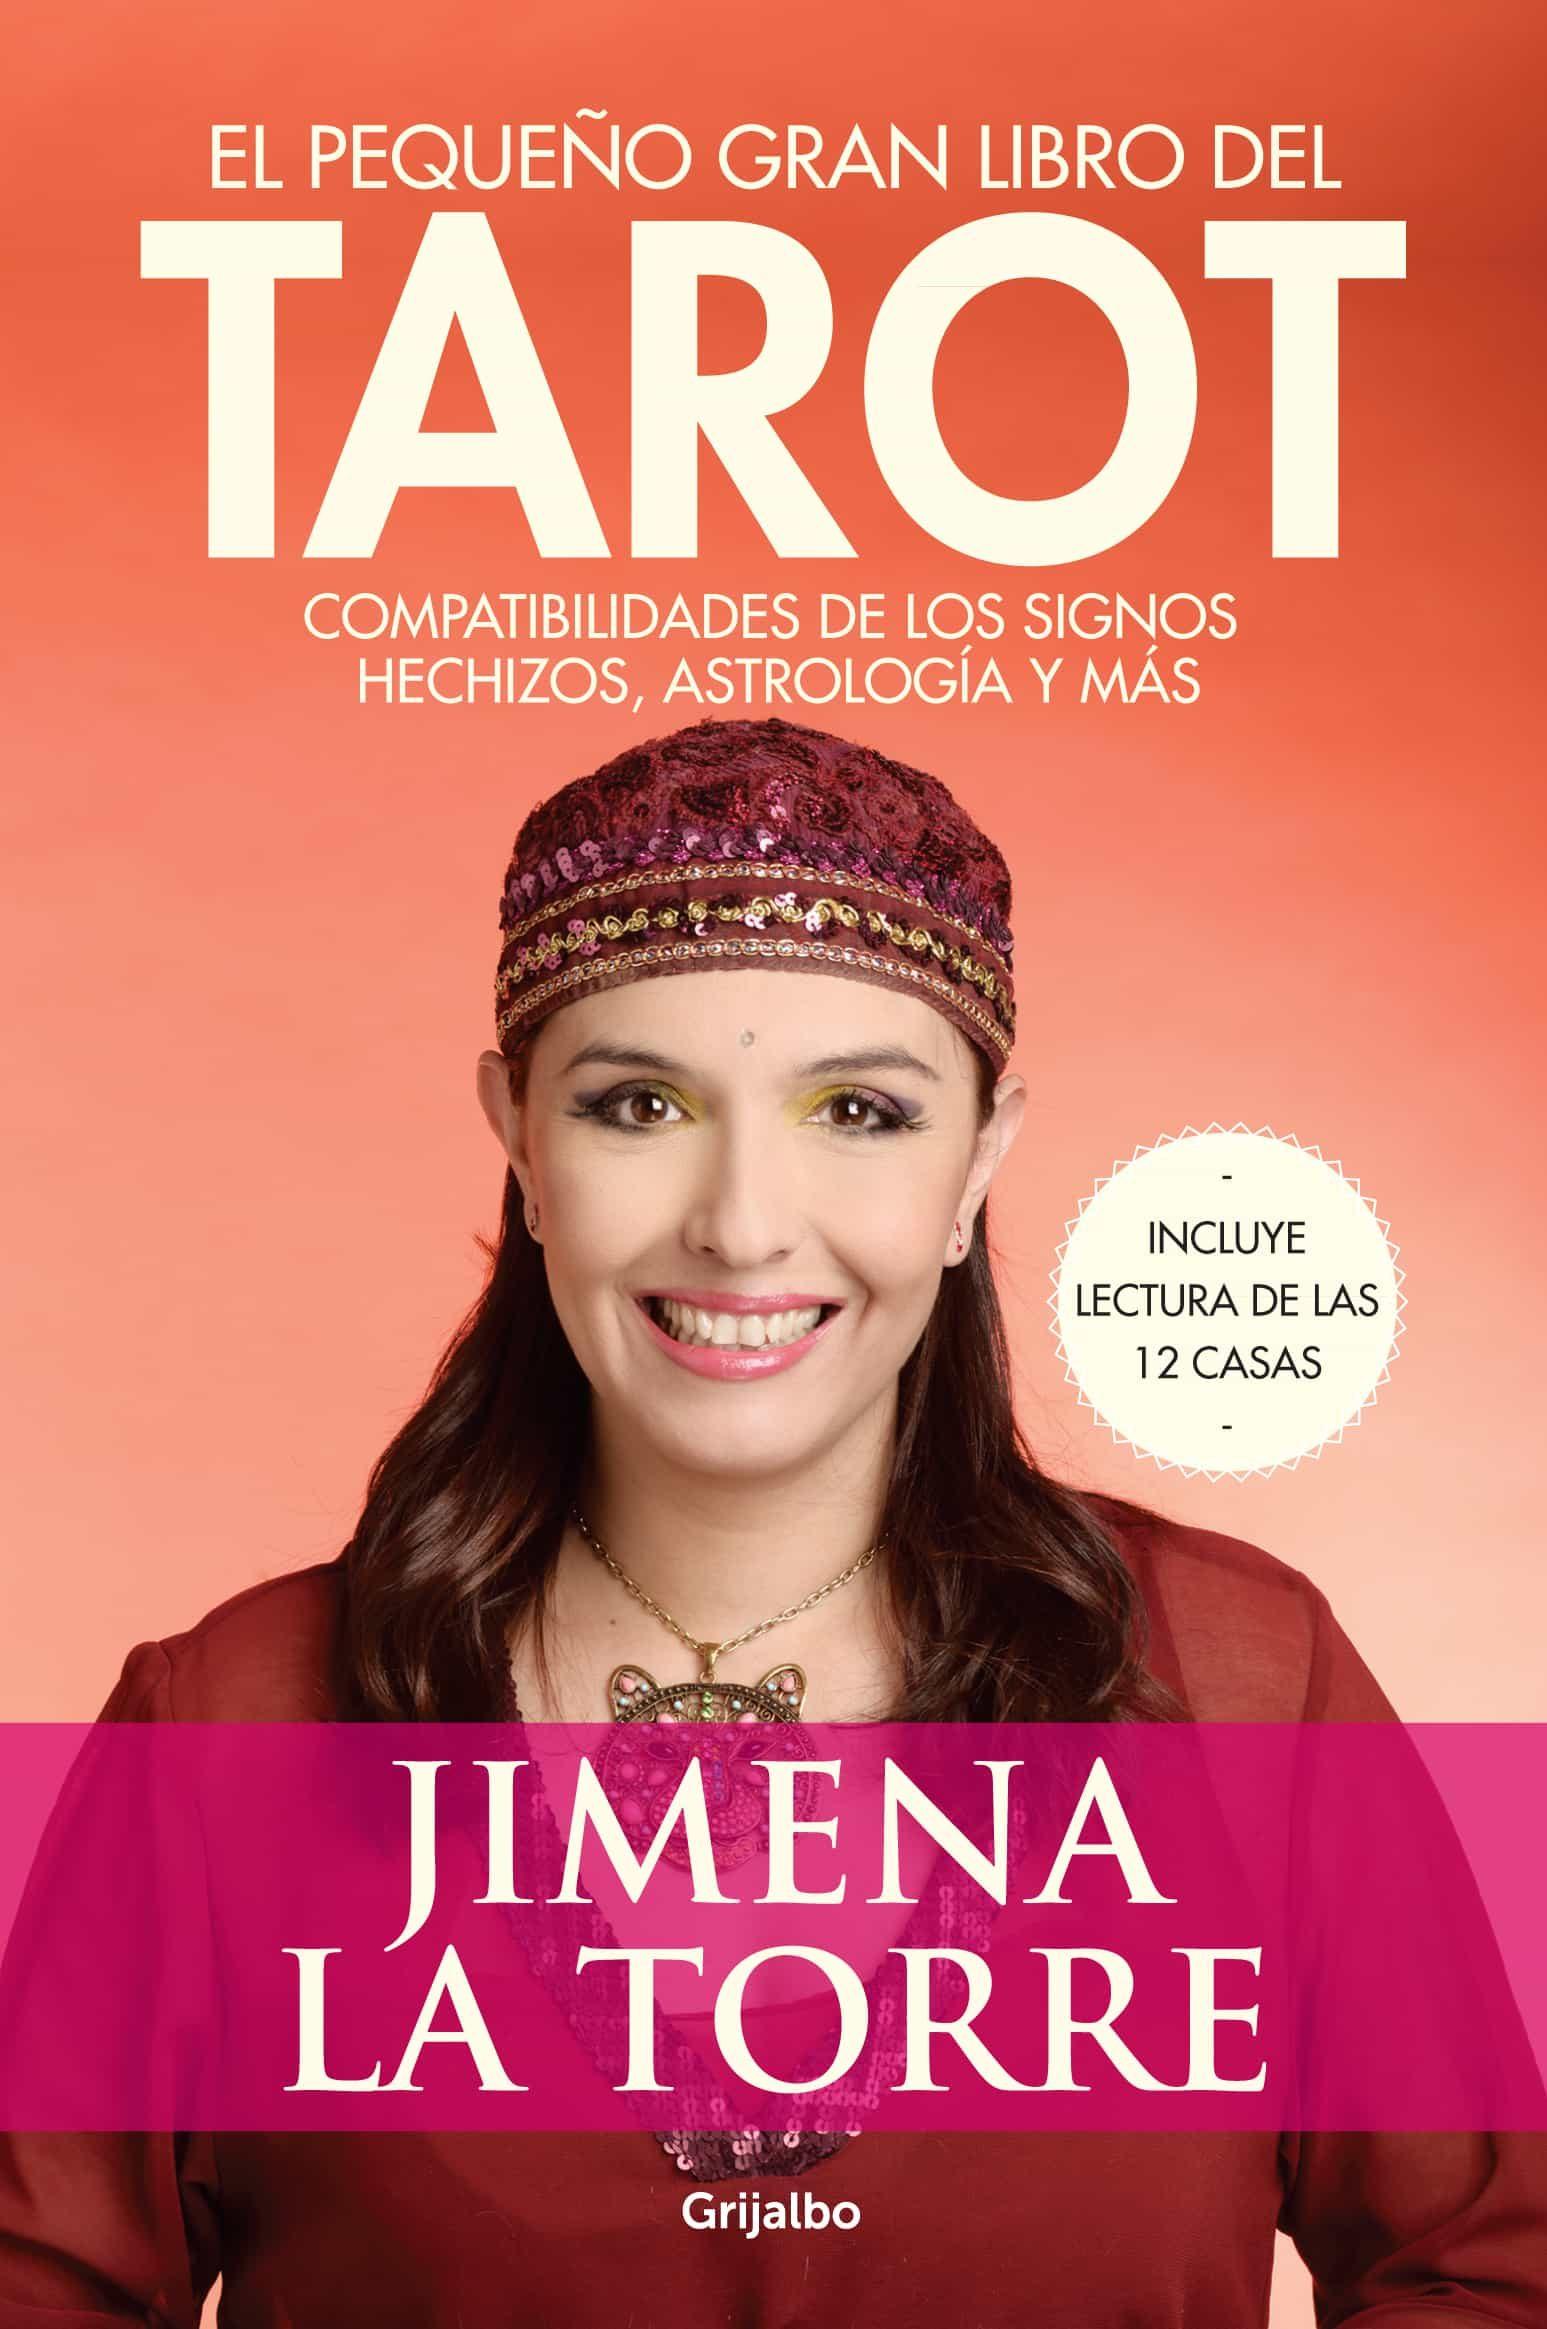 Jimena Latorre